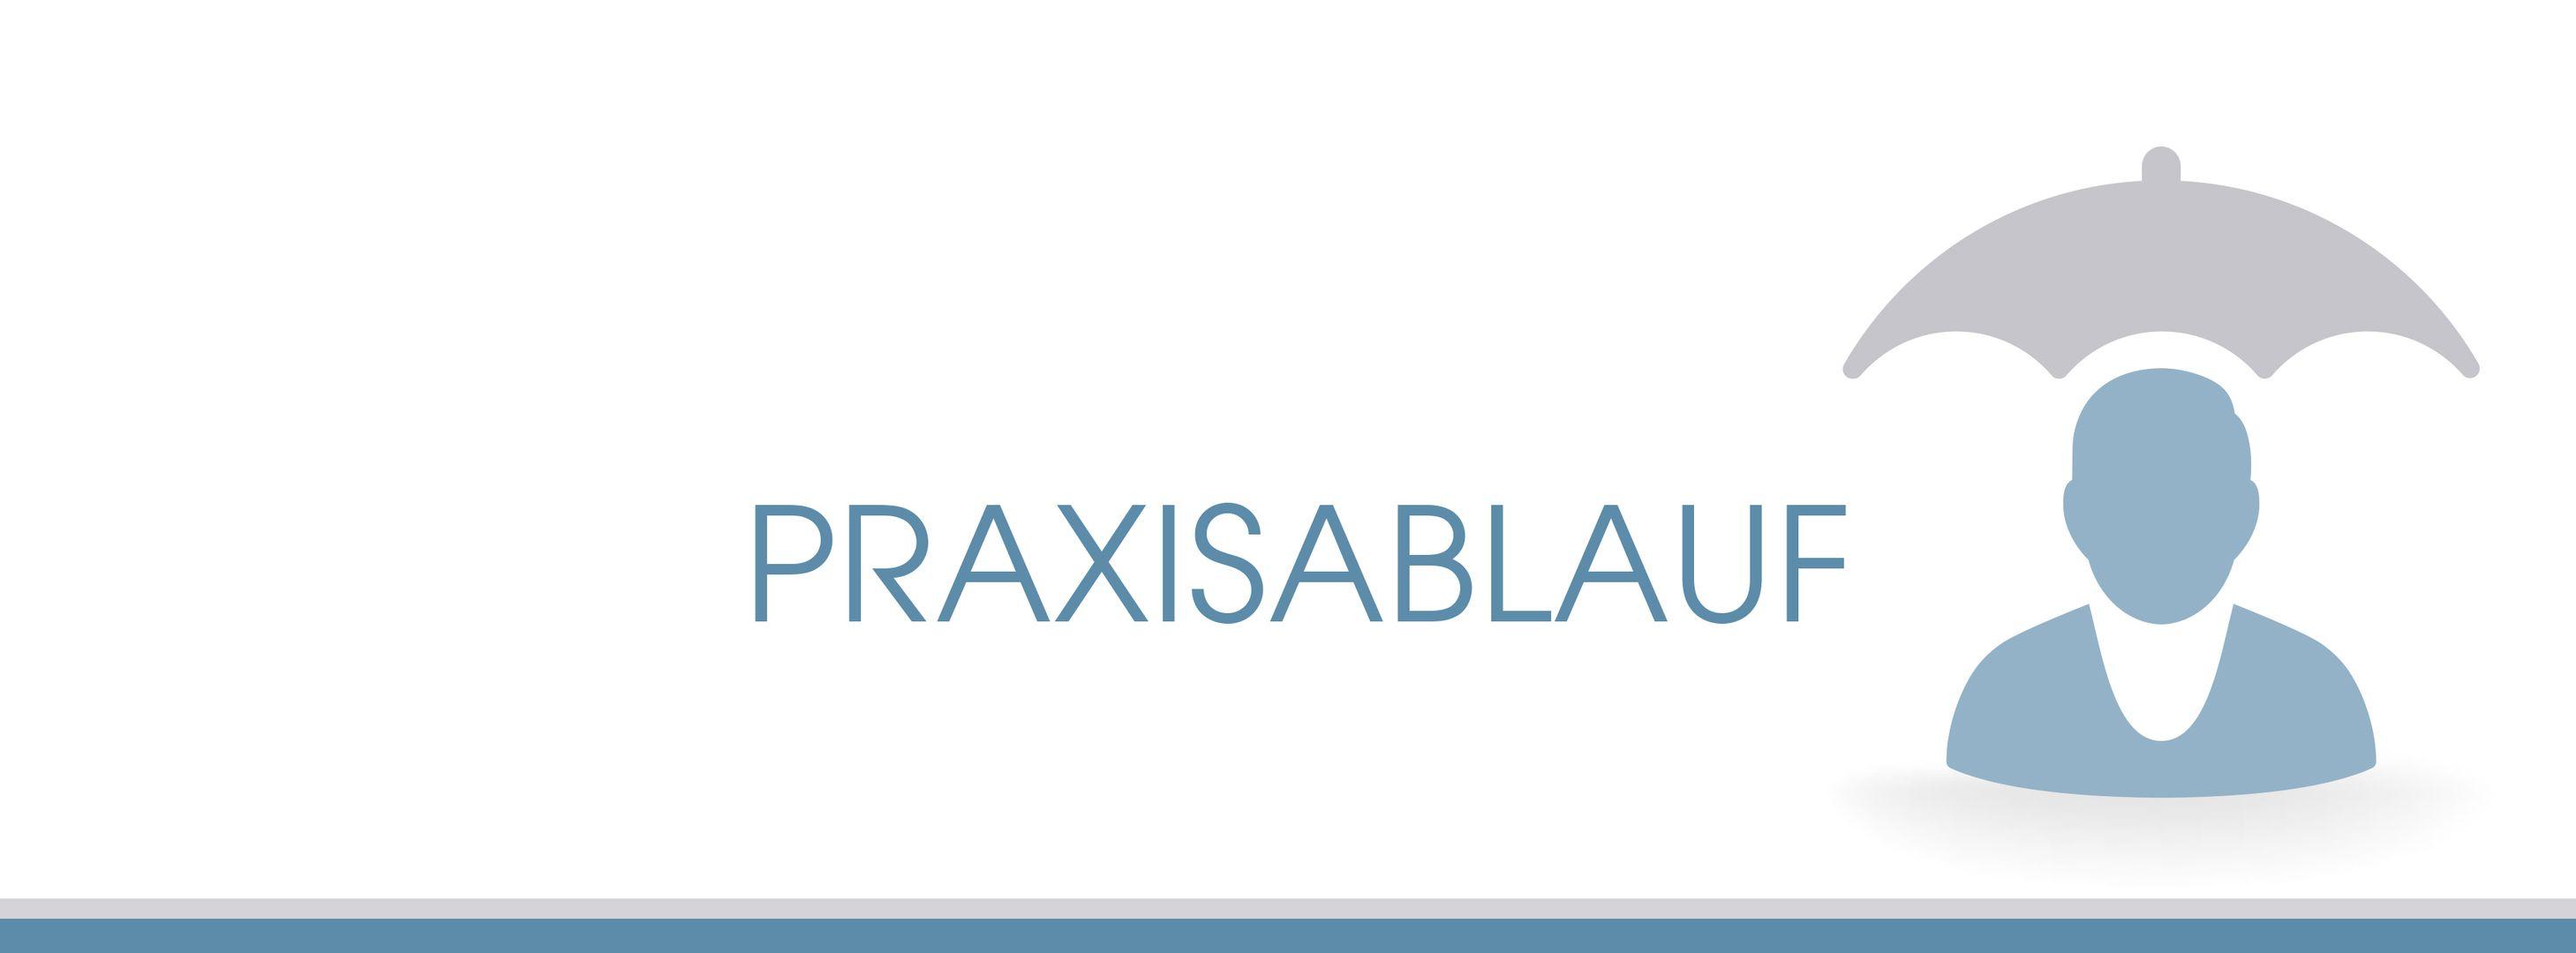 Praxisablauf   Praxis Dr. med. Pósfay